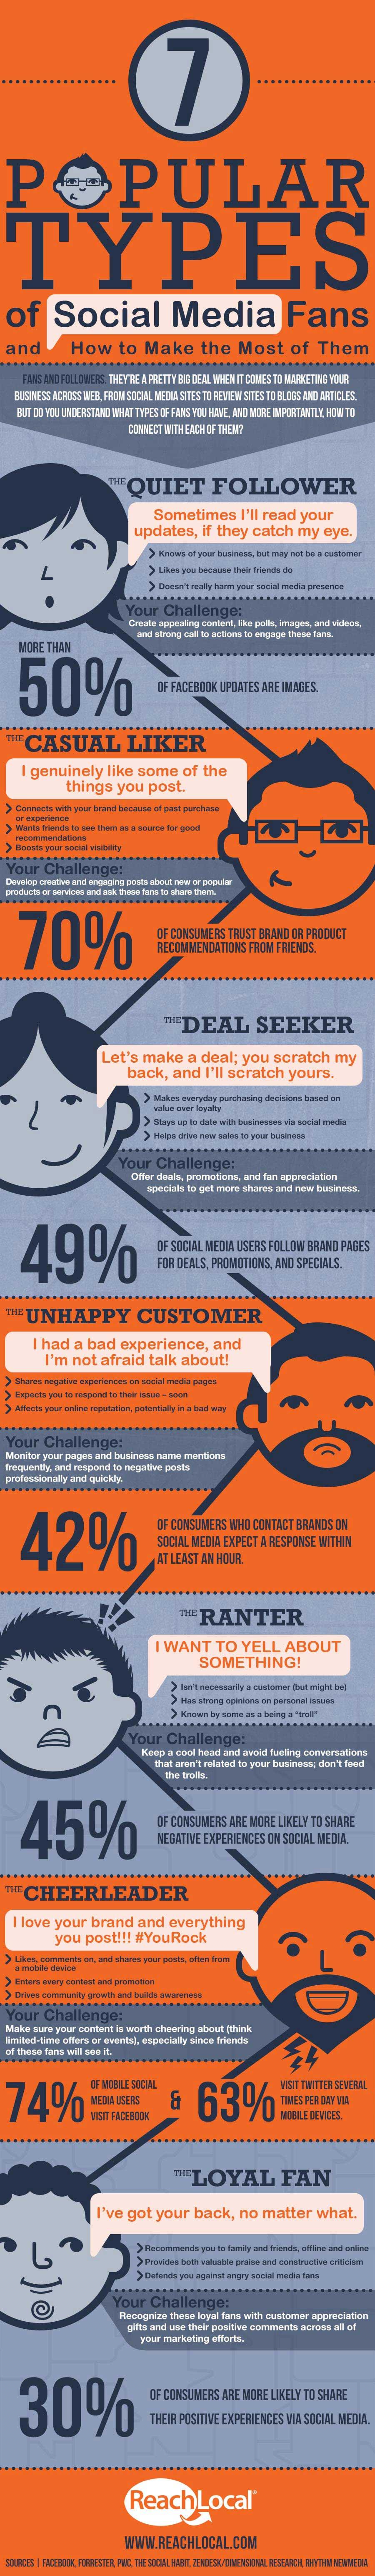 Infographic: 7 Types Of Popular Fans On Social Media